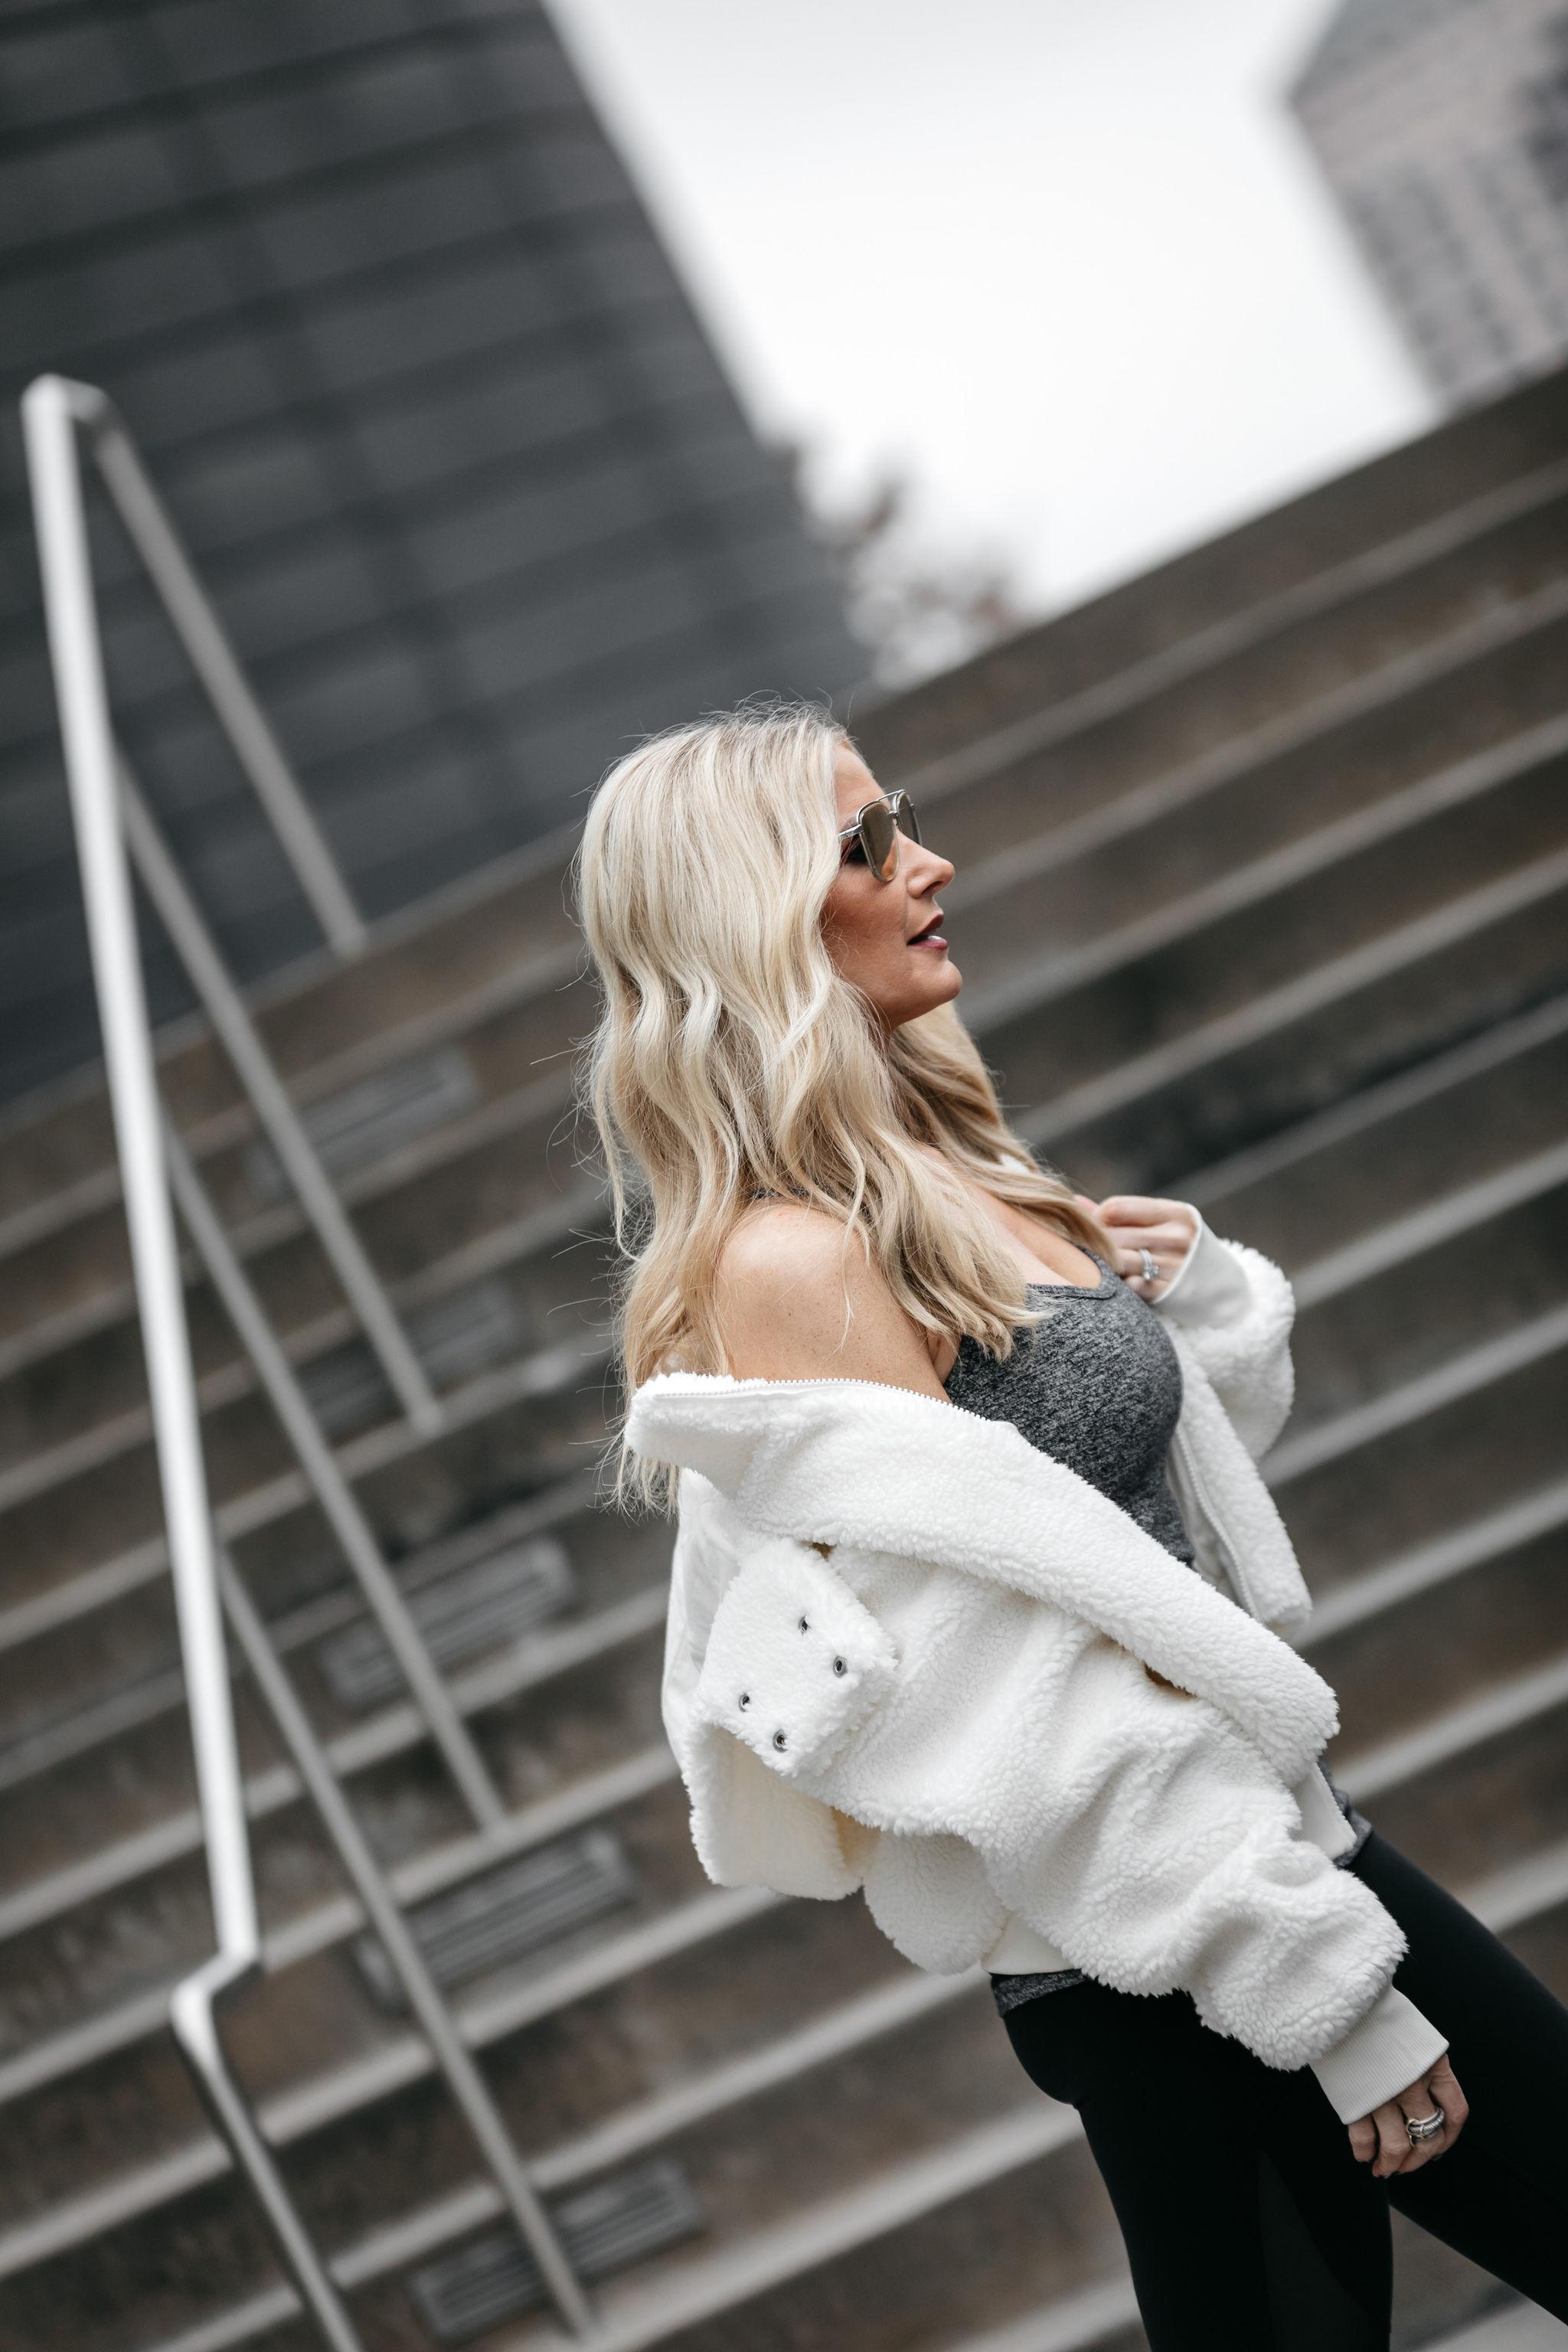 Dallas fashion blogger wearing Alo yoga teddy coat